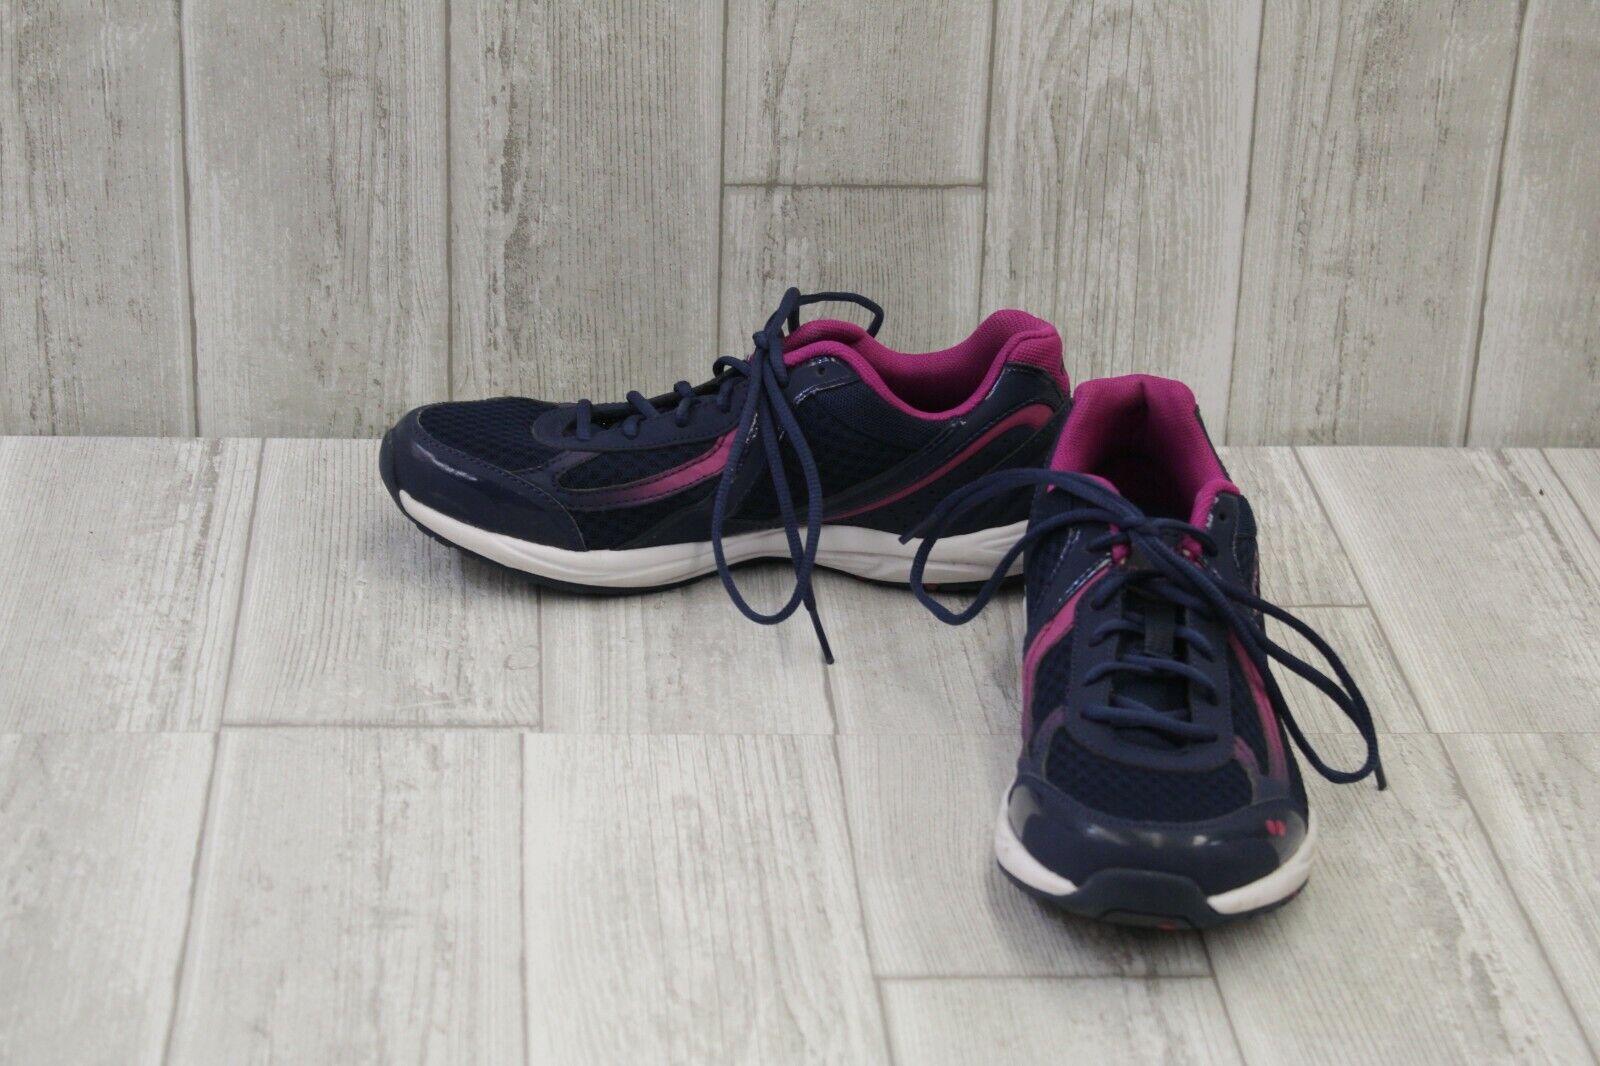 Ryka Dash 3 Athletic shoes - Women's Size 7.5 M - Navy Purple